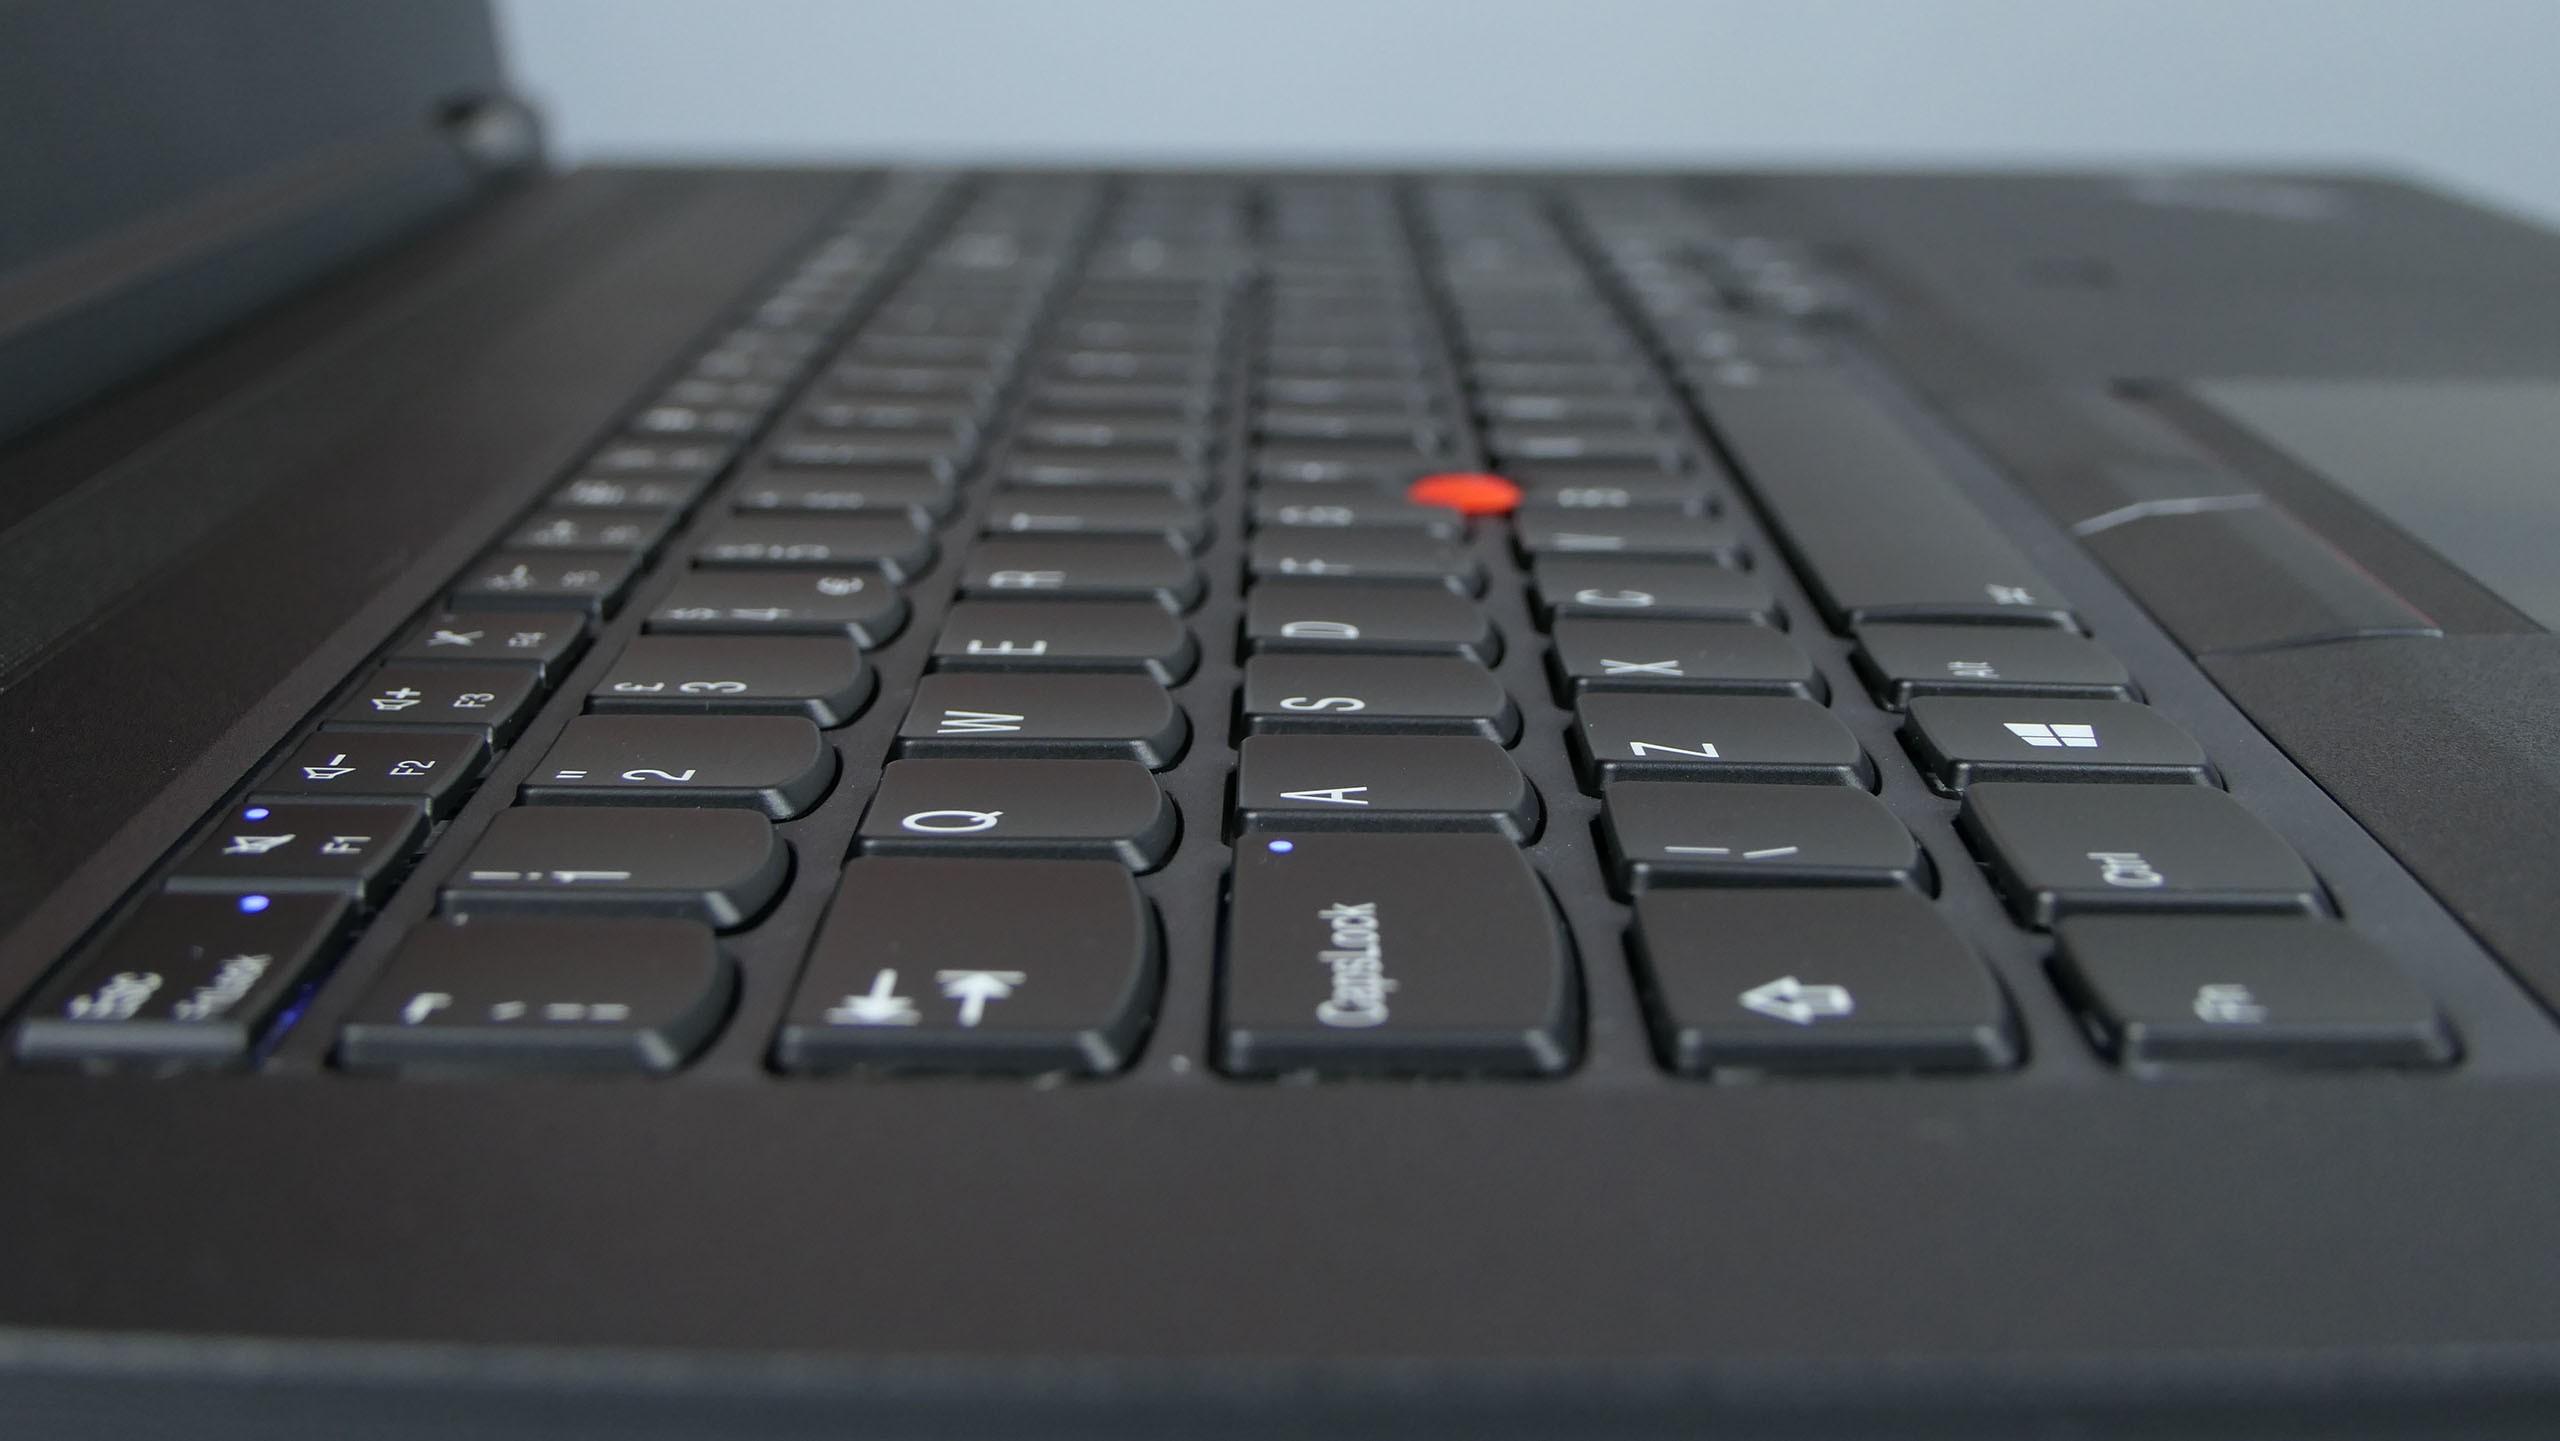 Lenovo ThinkPad P73 - klawiatura